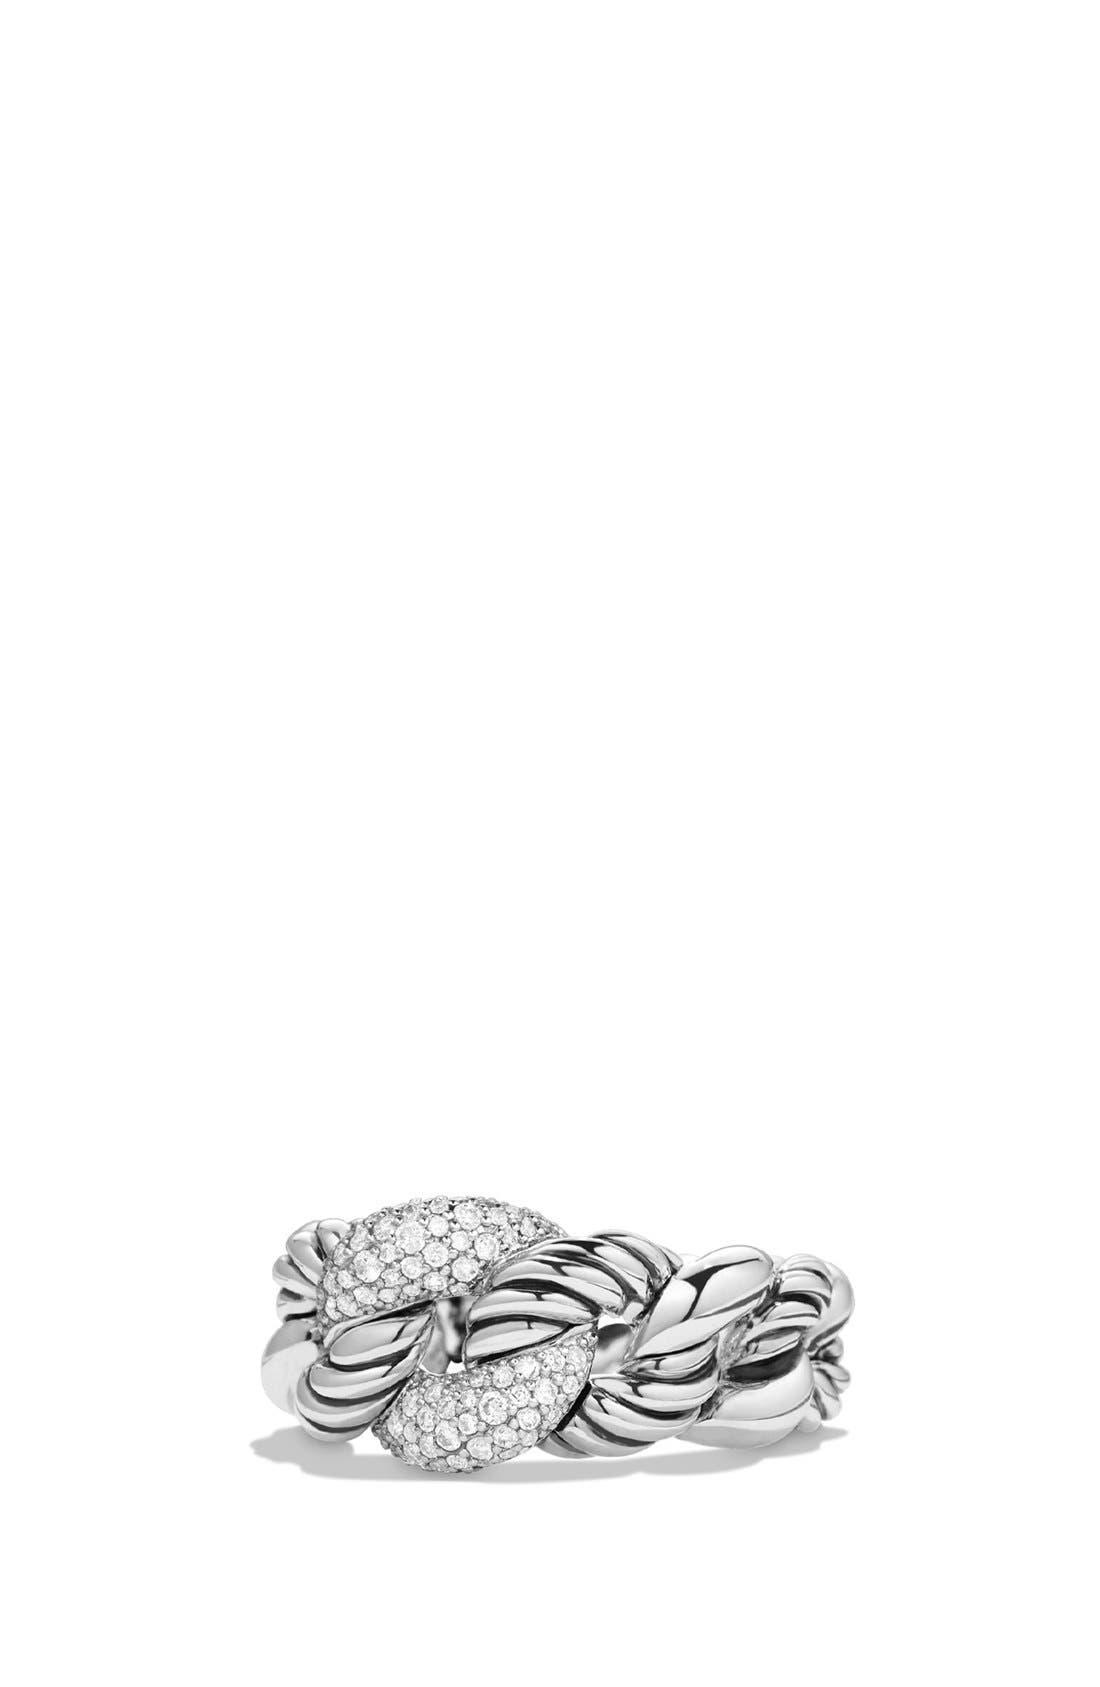 david yurman curb link ring with diamonds